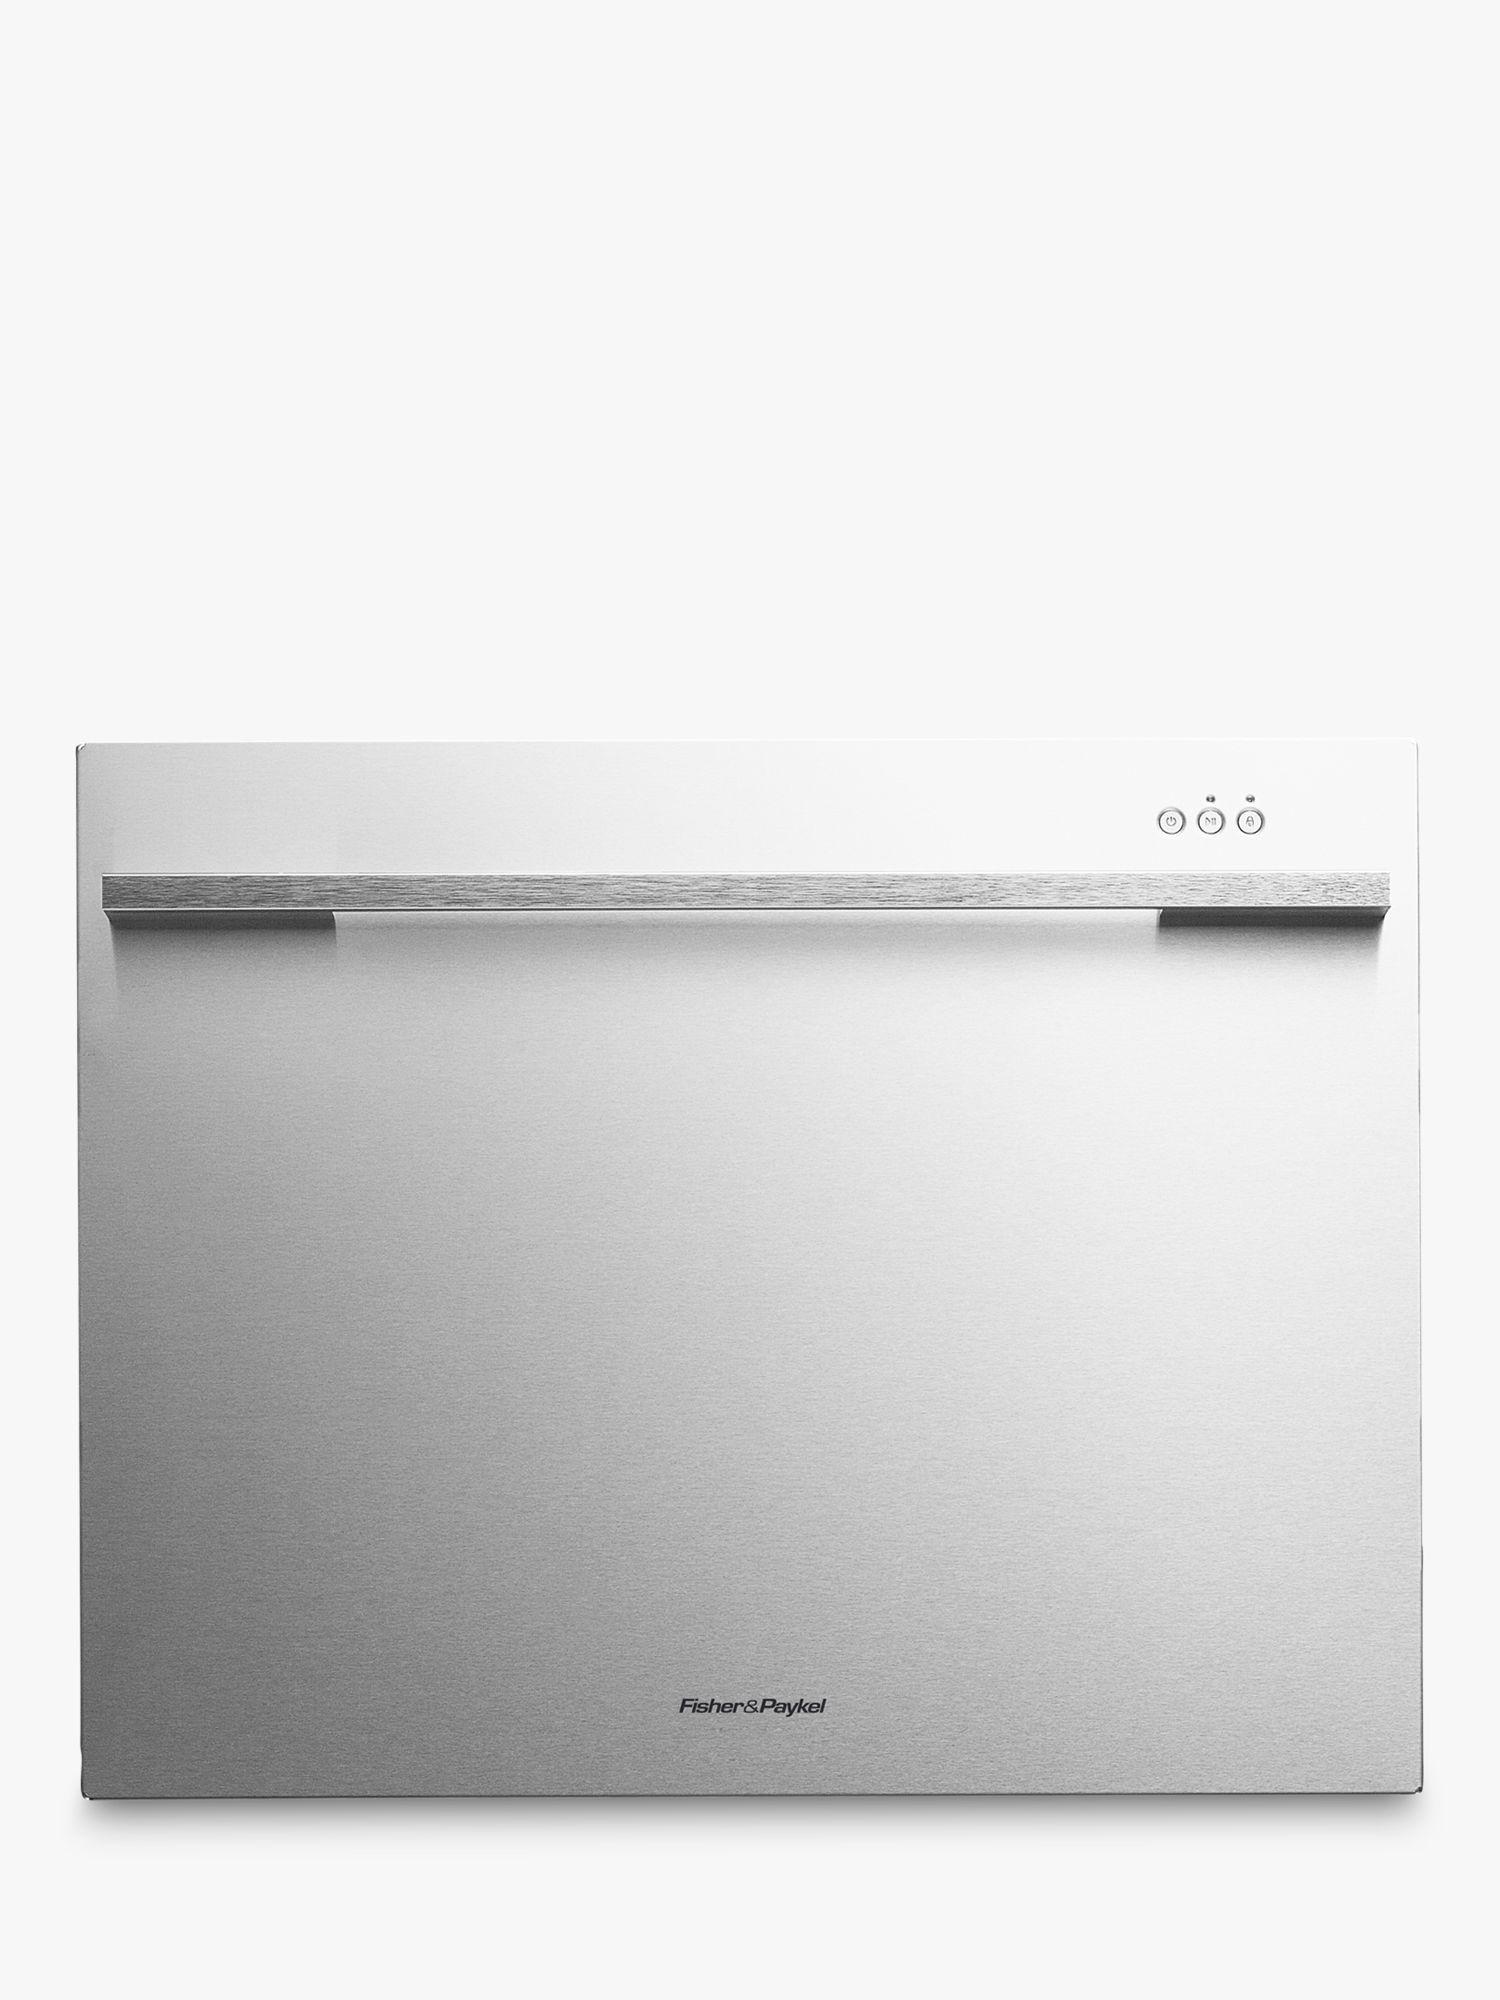 Fisher & Paykel Fisher & Paykel DD60SDFHTX7 Designer Built-in Single DishDrawer Dishwasher, Stainless Steel